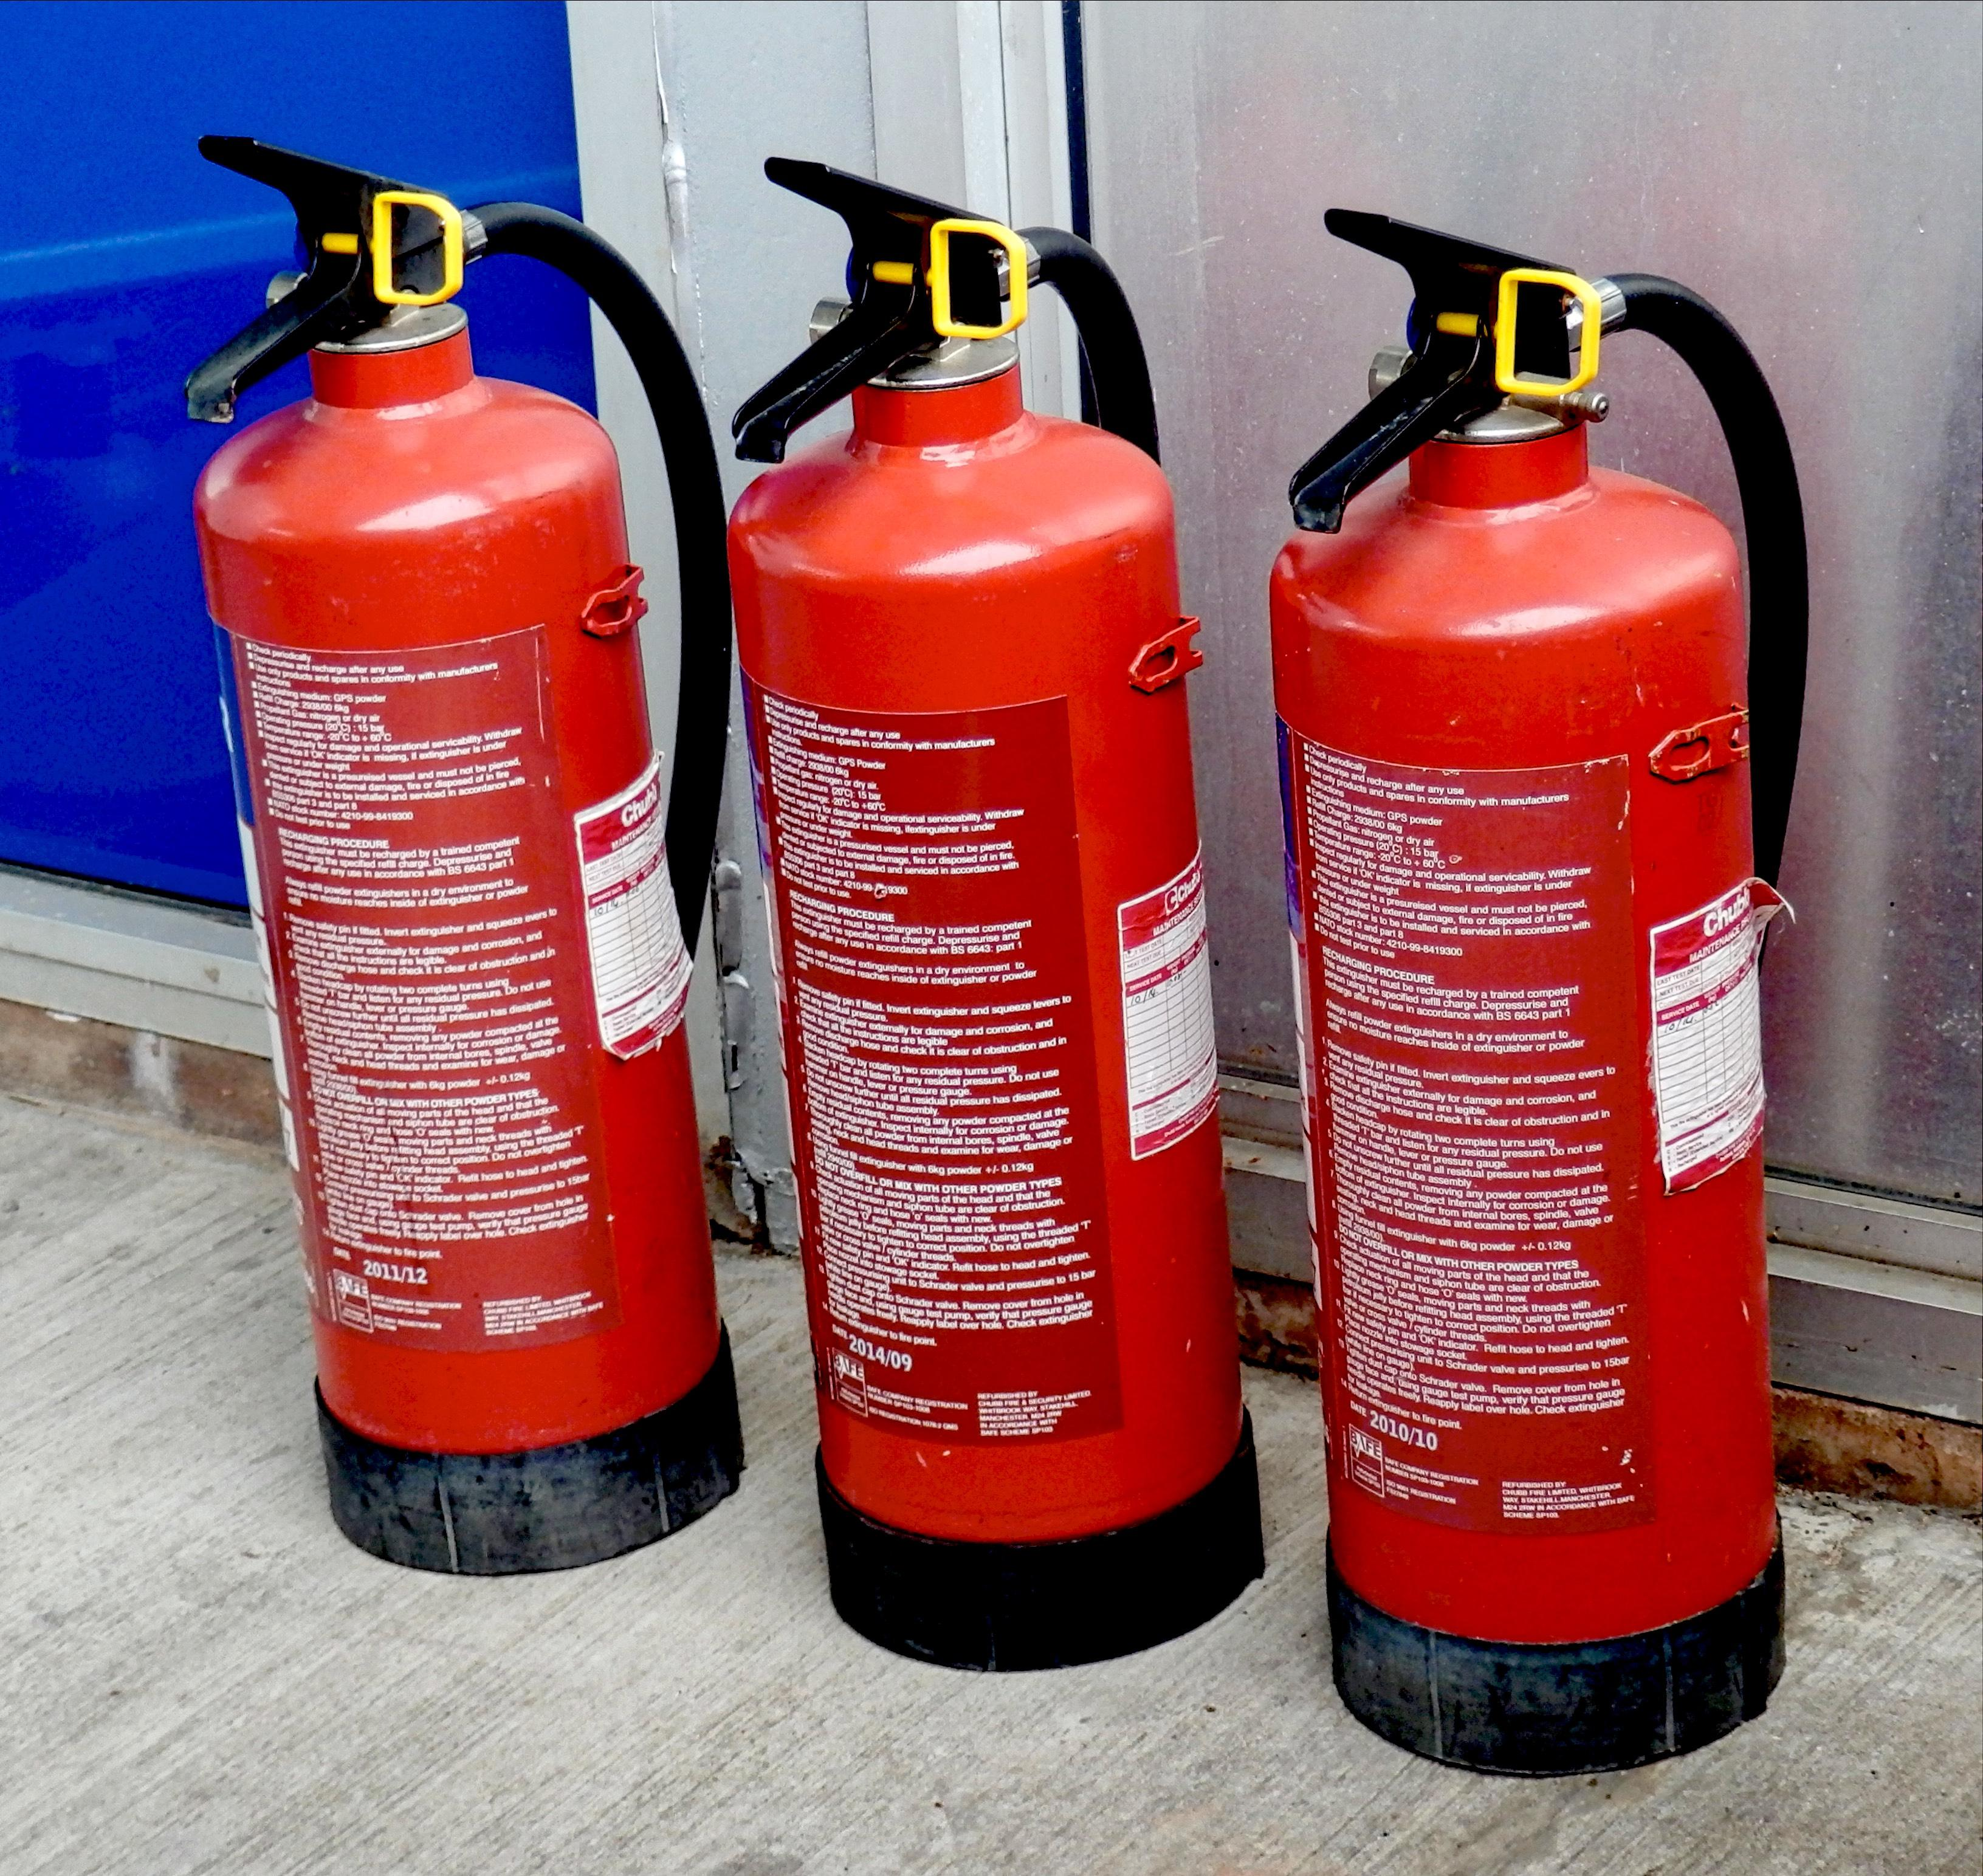 New Zealand – Hazardous Substances (Compressed Gases) Regulations